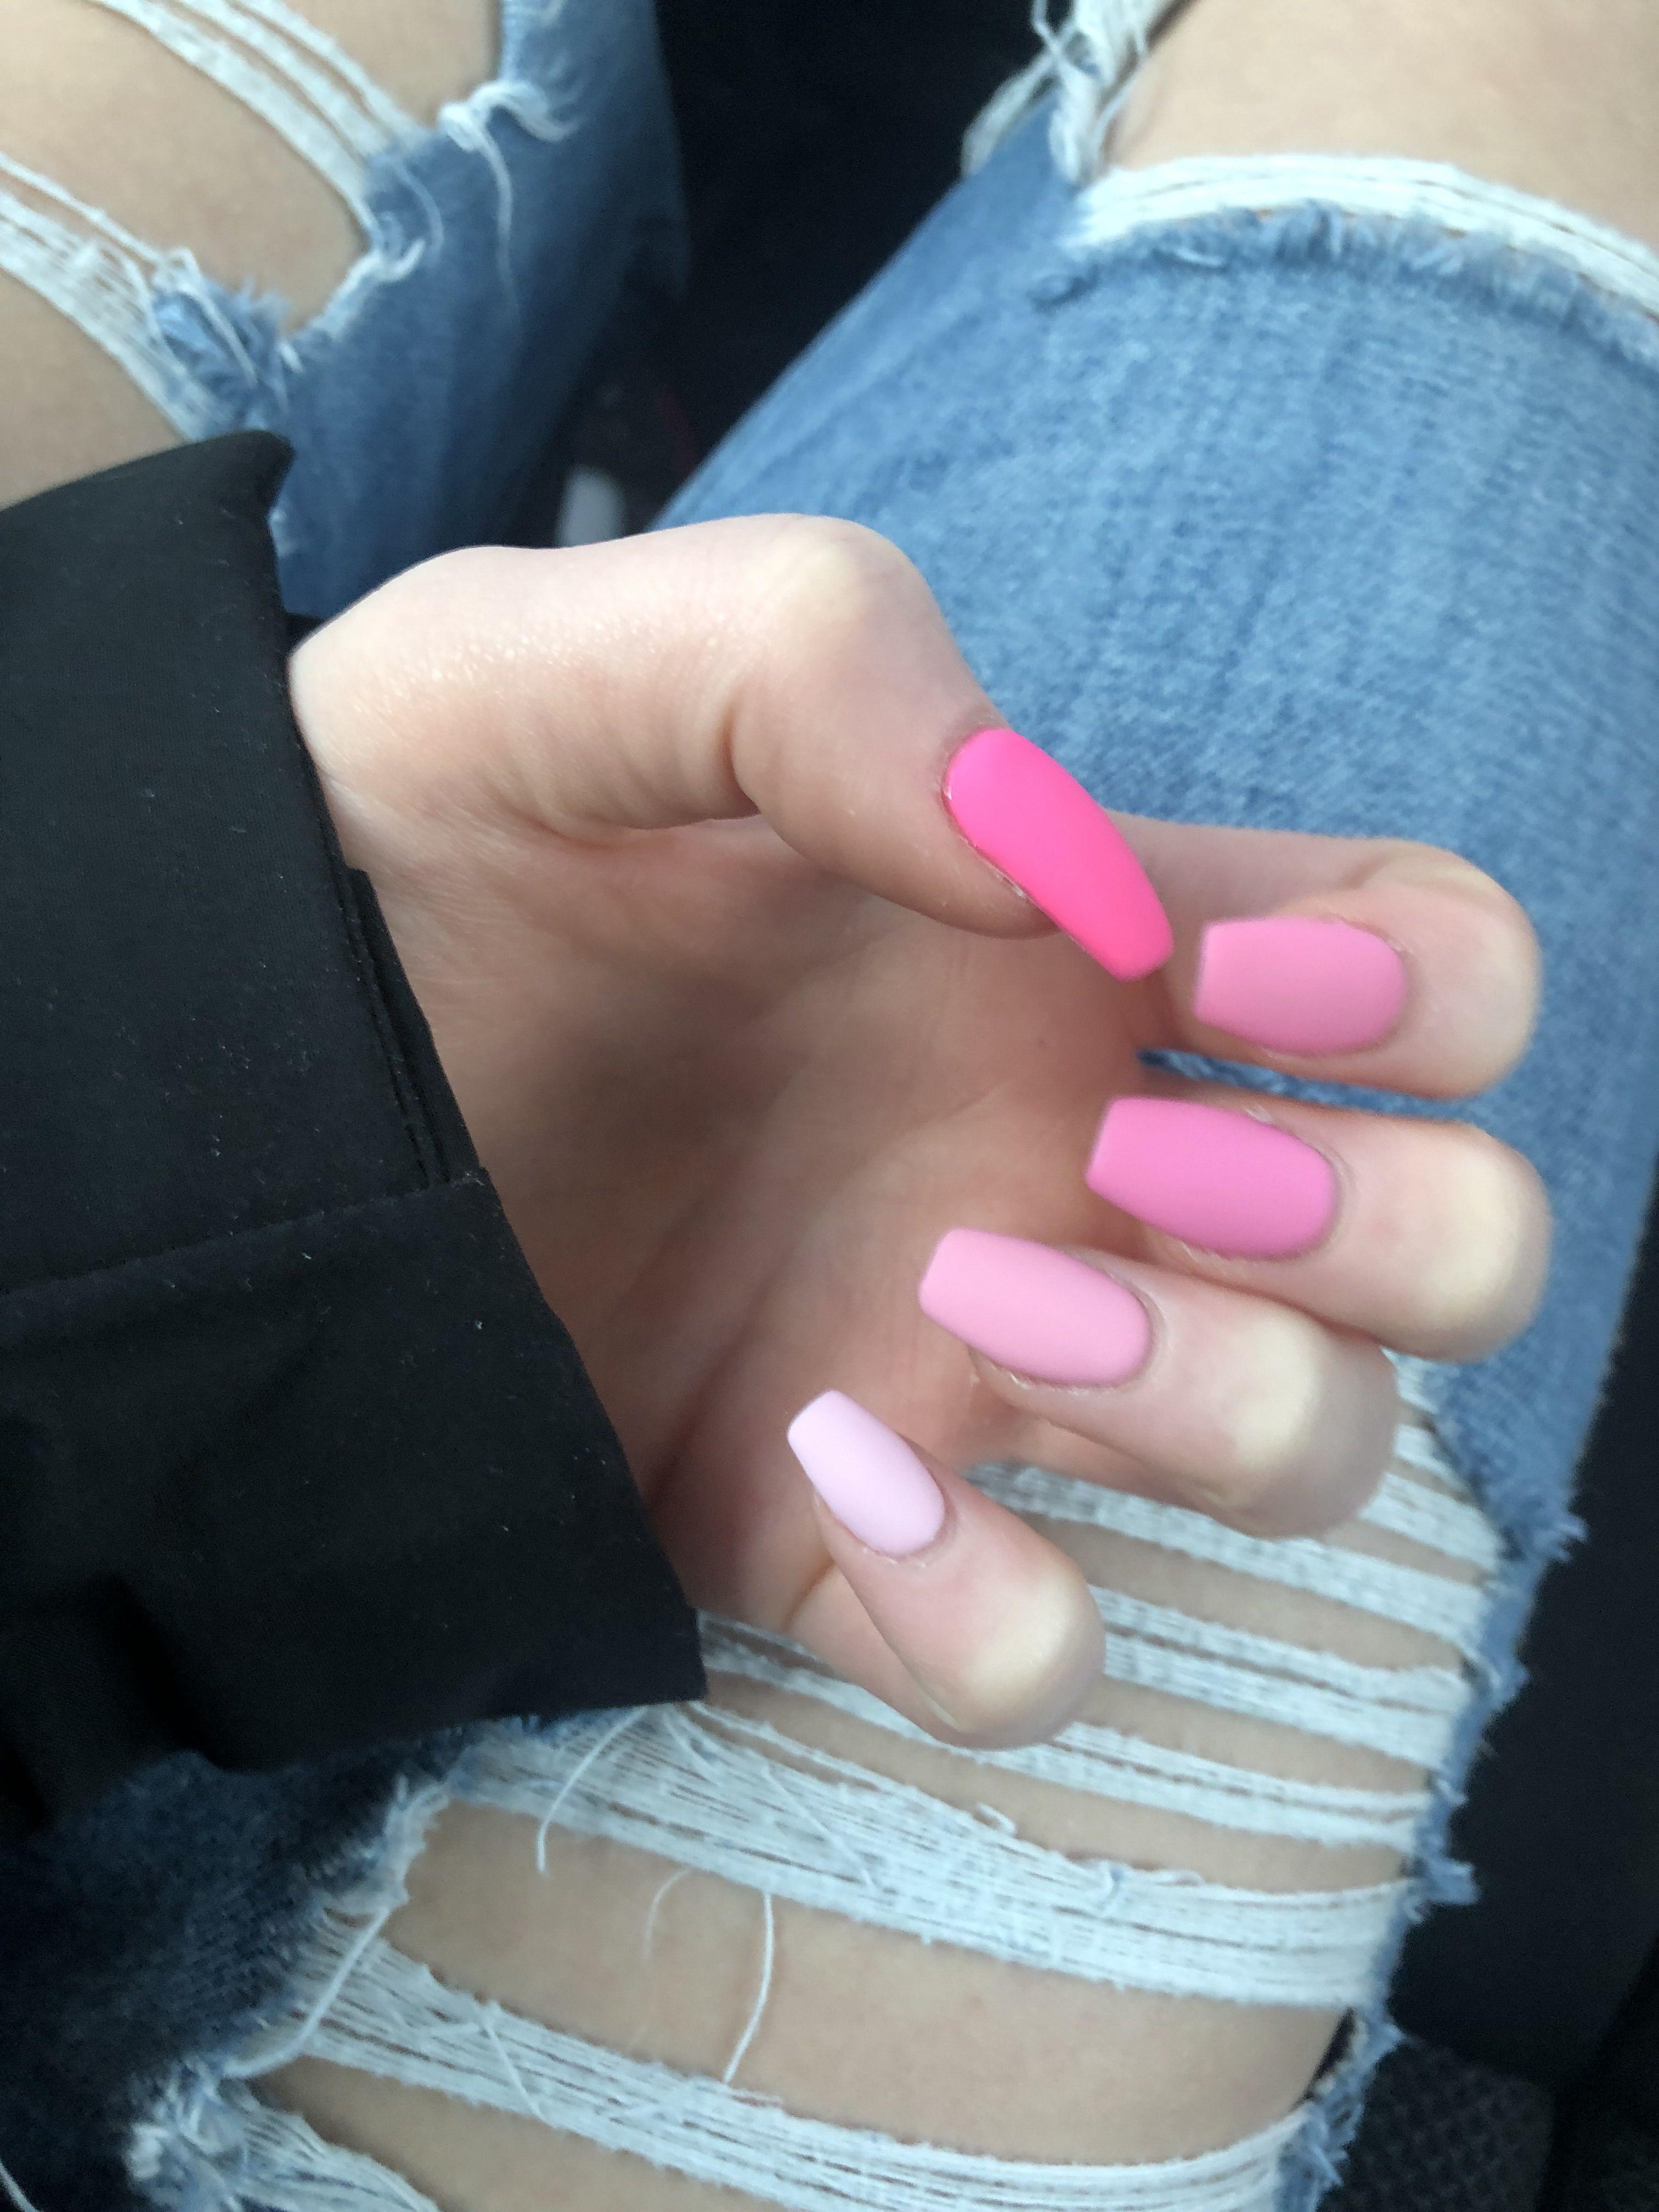 Pin By On Nails Pink Acrylic Nails Cute Acrylic Nail Designs Best Acrylic Nails